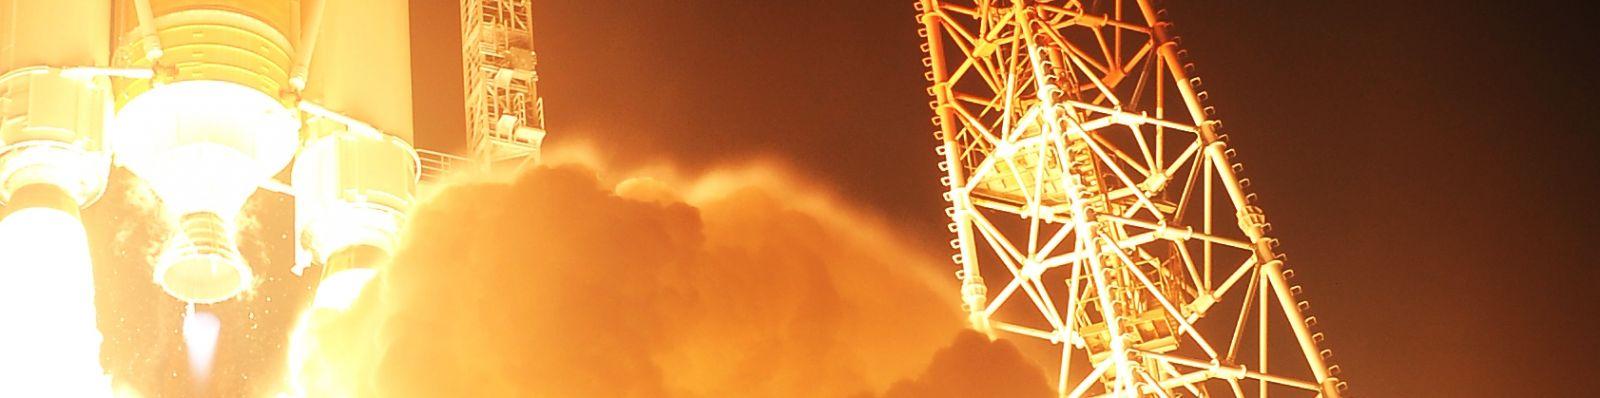 Launch-of-JAXA-H-IIA-with-ALOS-2-satellite-JAXA-photo-posted-on-SpaceFlight-Insider